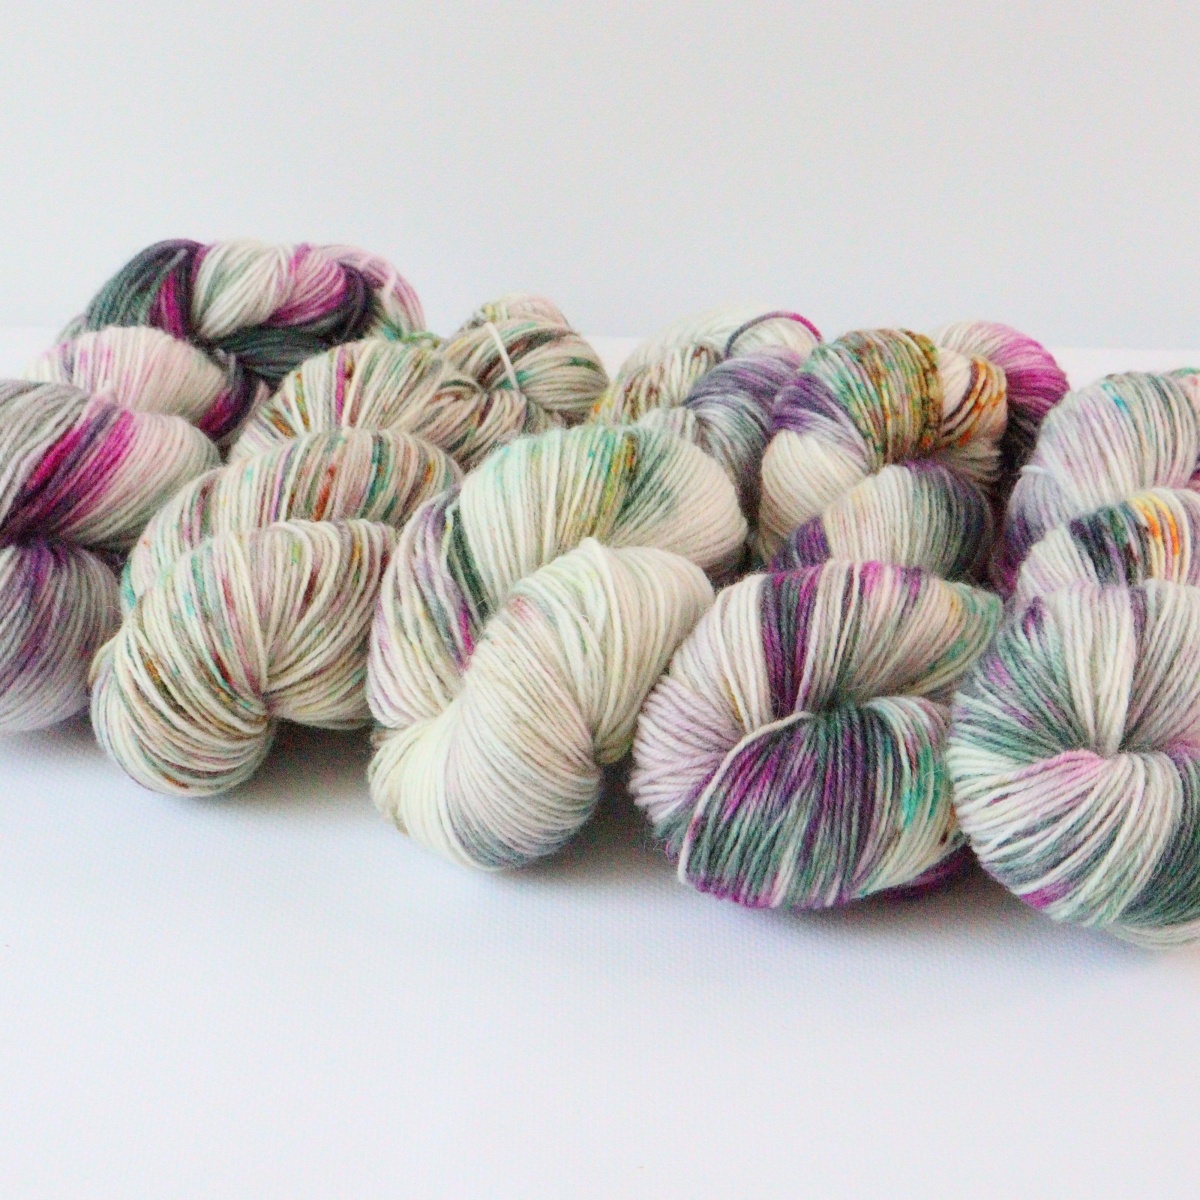 woodico.pro hand dyed yarn 079 4 1200x1200 - Hand dyed yarn / 079